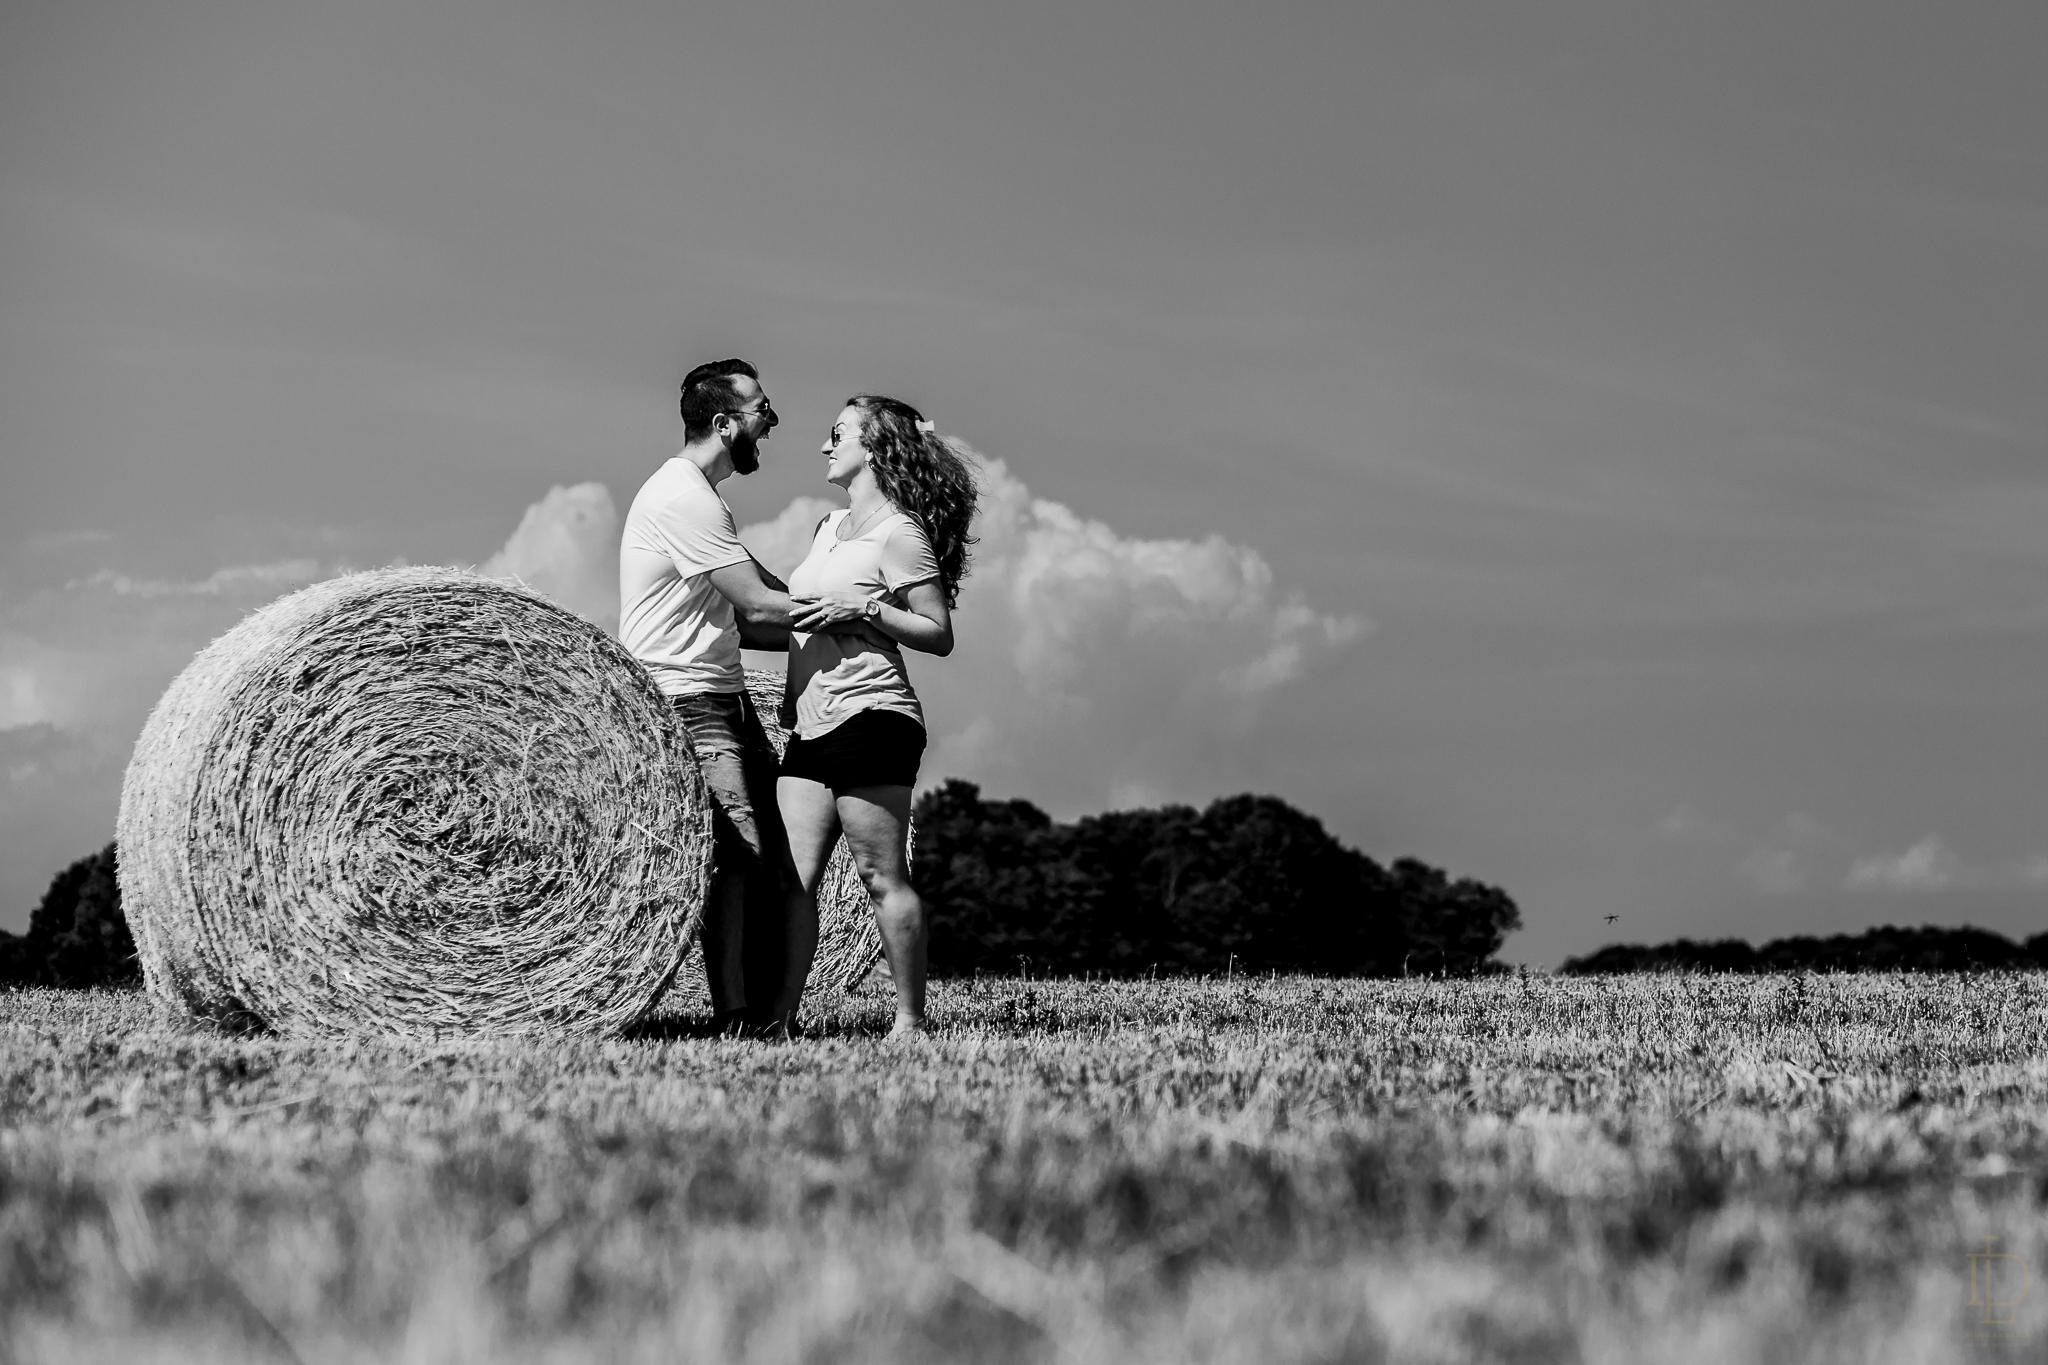 Prince-edward-county-engagement-photos-4.jpg